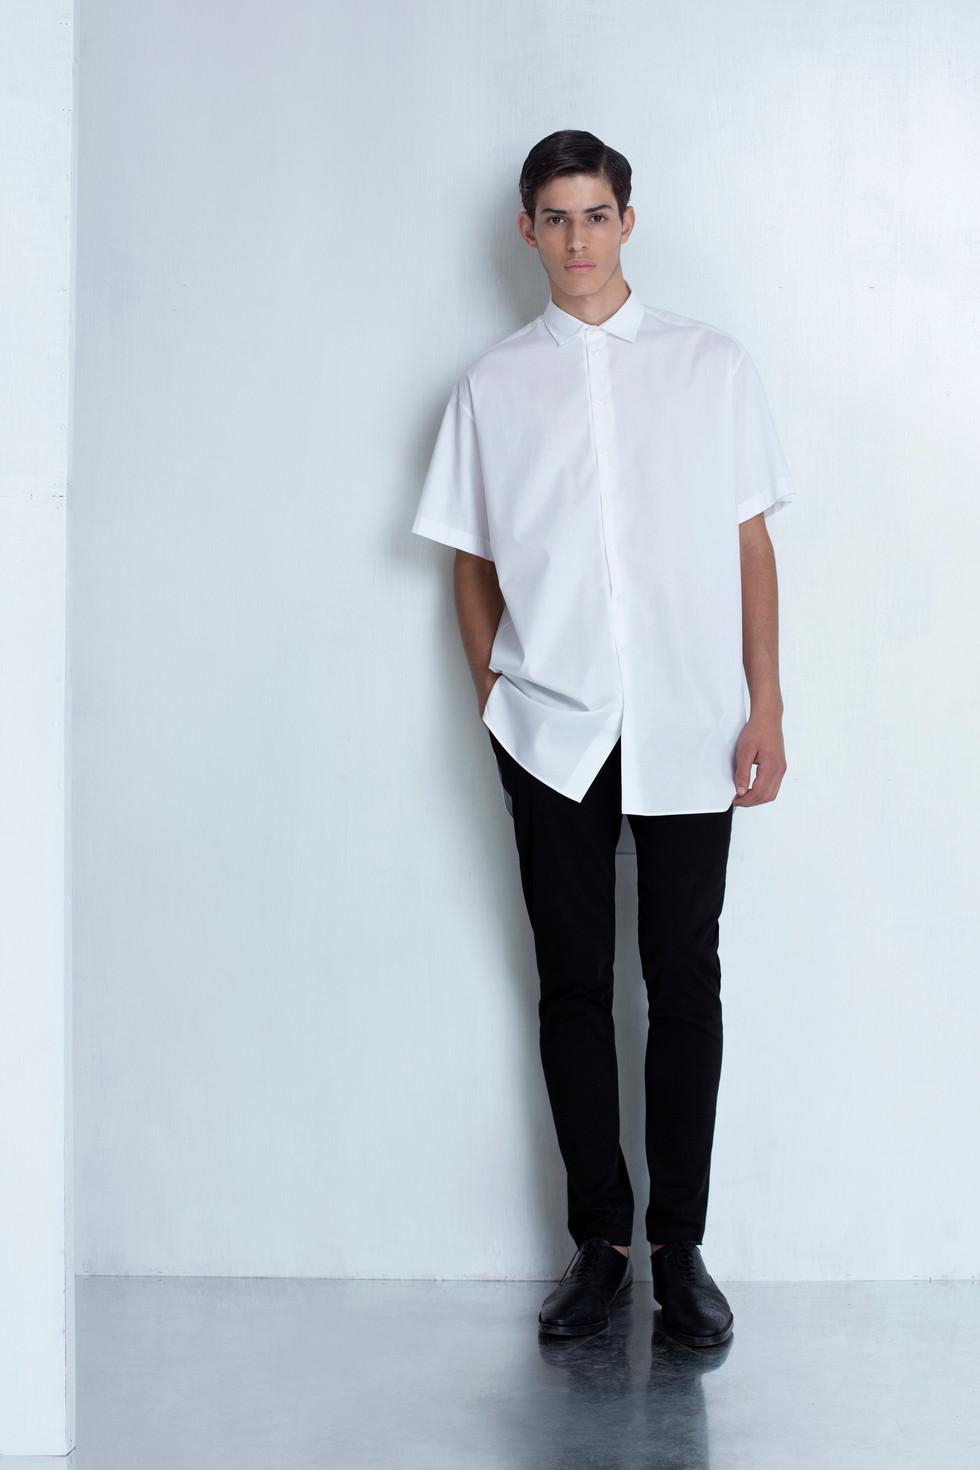 Ariel_Bassan_Minimal_Menswear_AW_LookBook_Tailored_Fashion